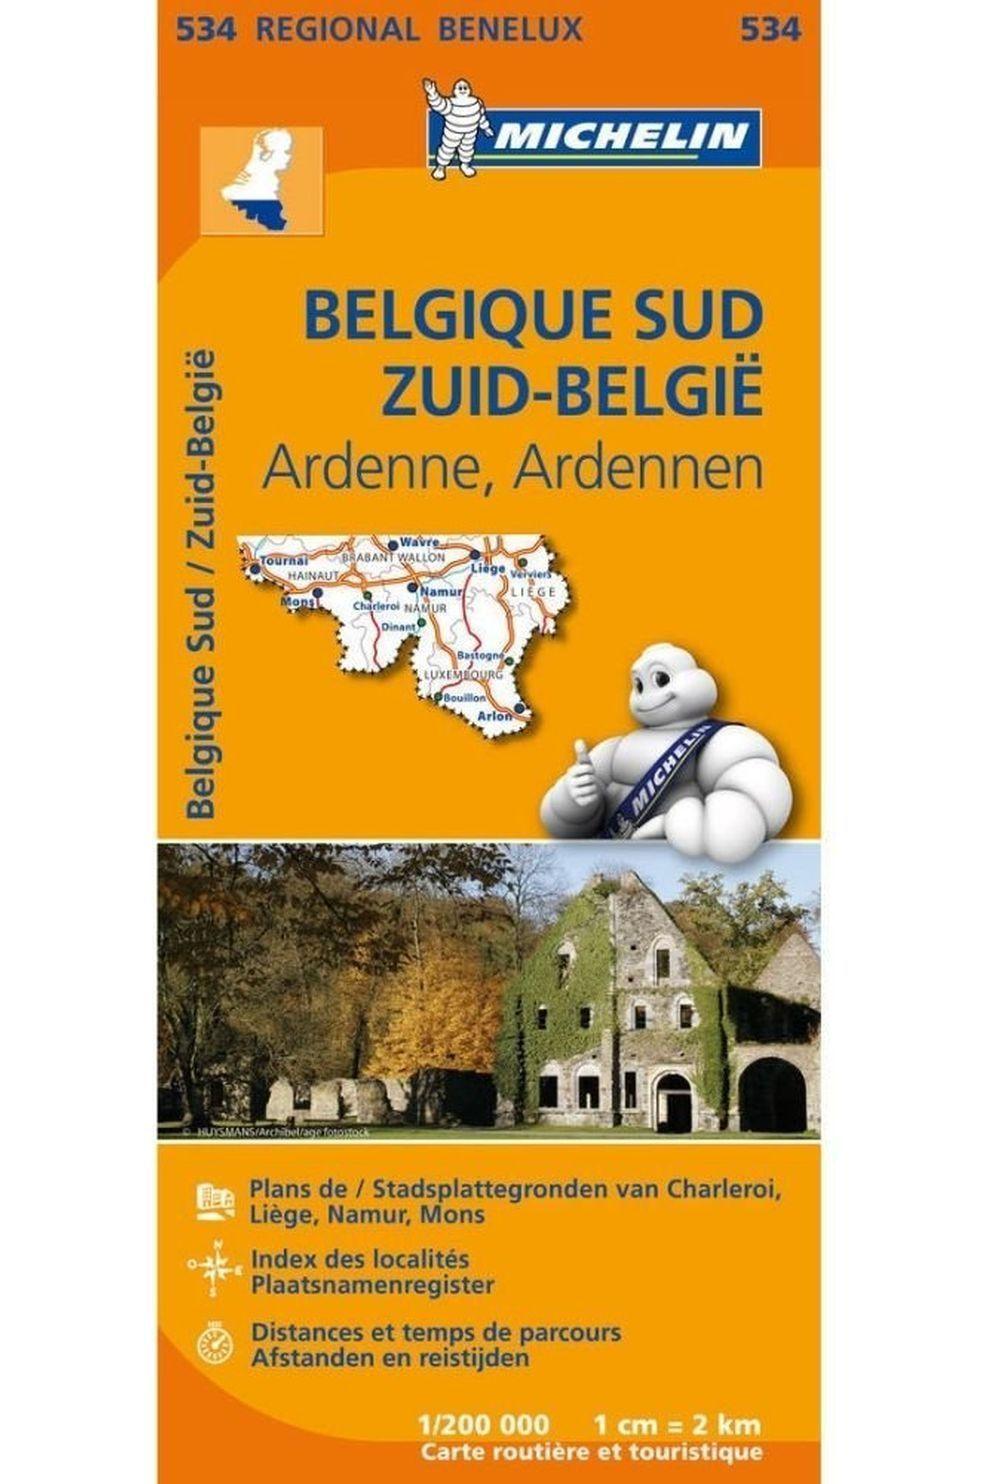 Michelin Reisgids België Zuid Ardennen 534 mich (r) - 2020